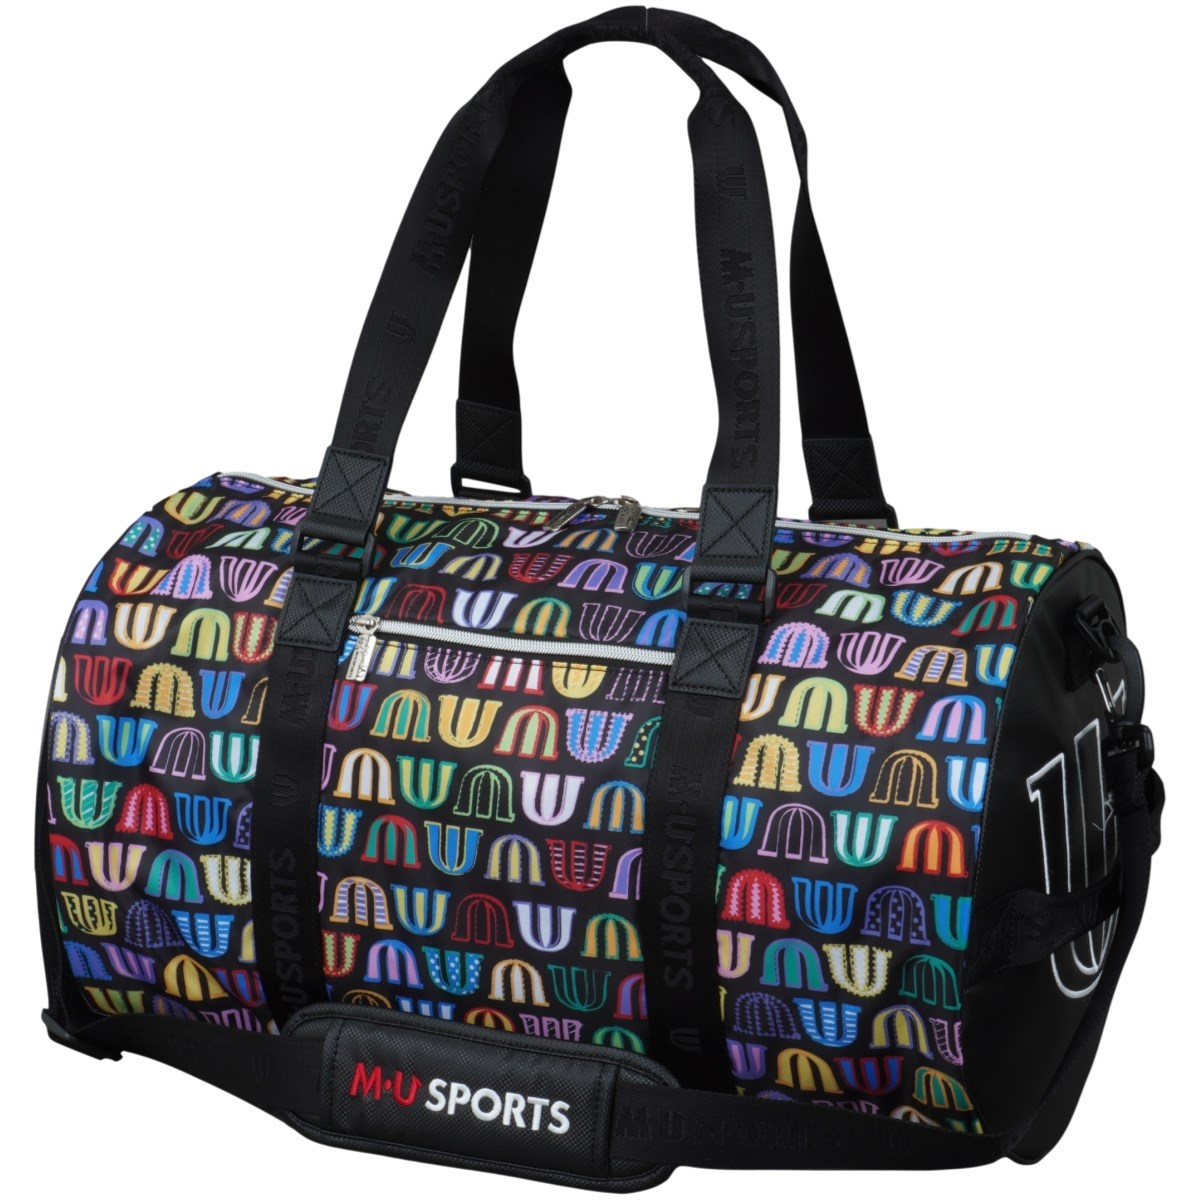 MUスポーツ M.U SPORTS ロゴ総柄ボストンバッグ ブラック